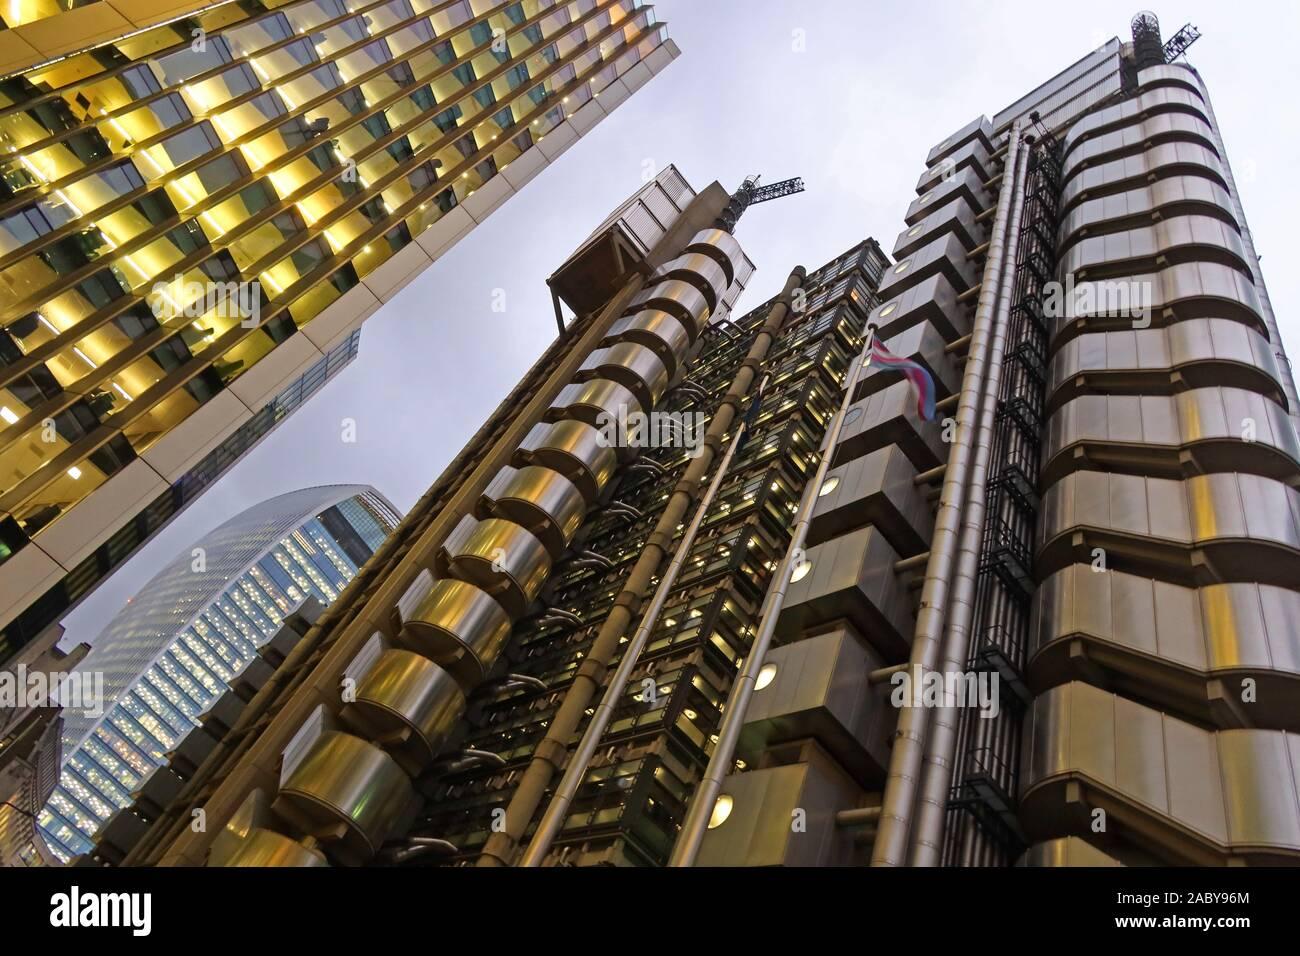 Dieses Stockfoto: The Lloyds Insurance Building, London, Lloyds Building, Lime Street EC3M 7HA, in der Abenddämmerung - 2ABY96